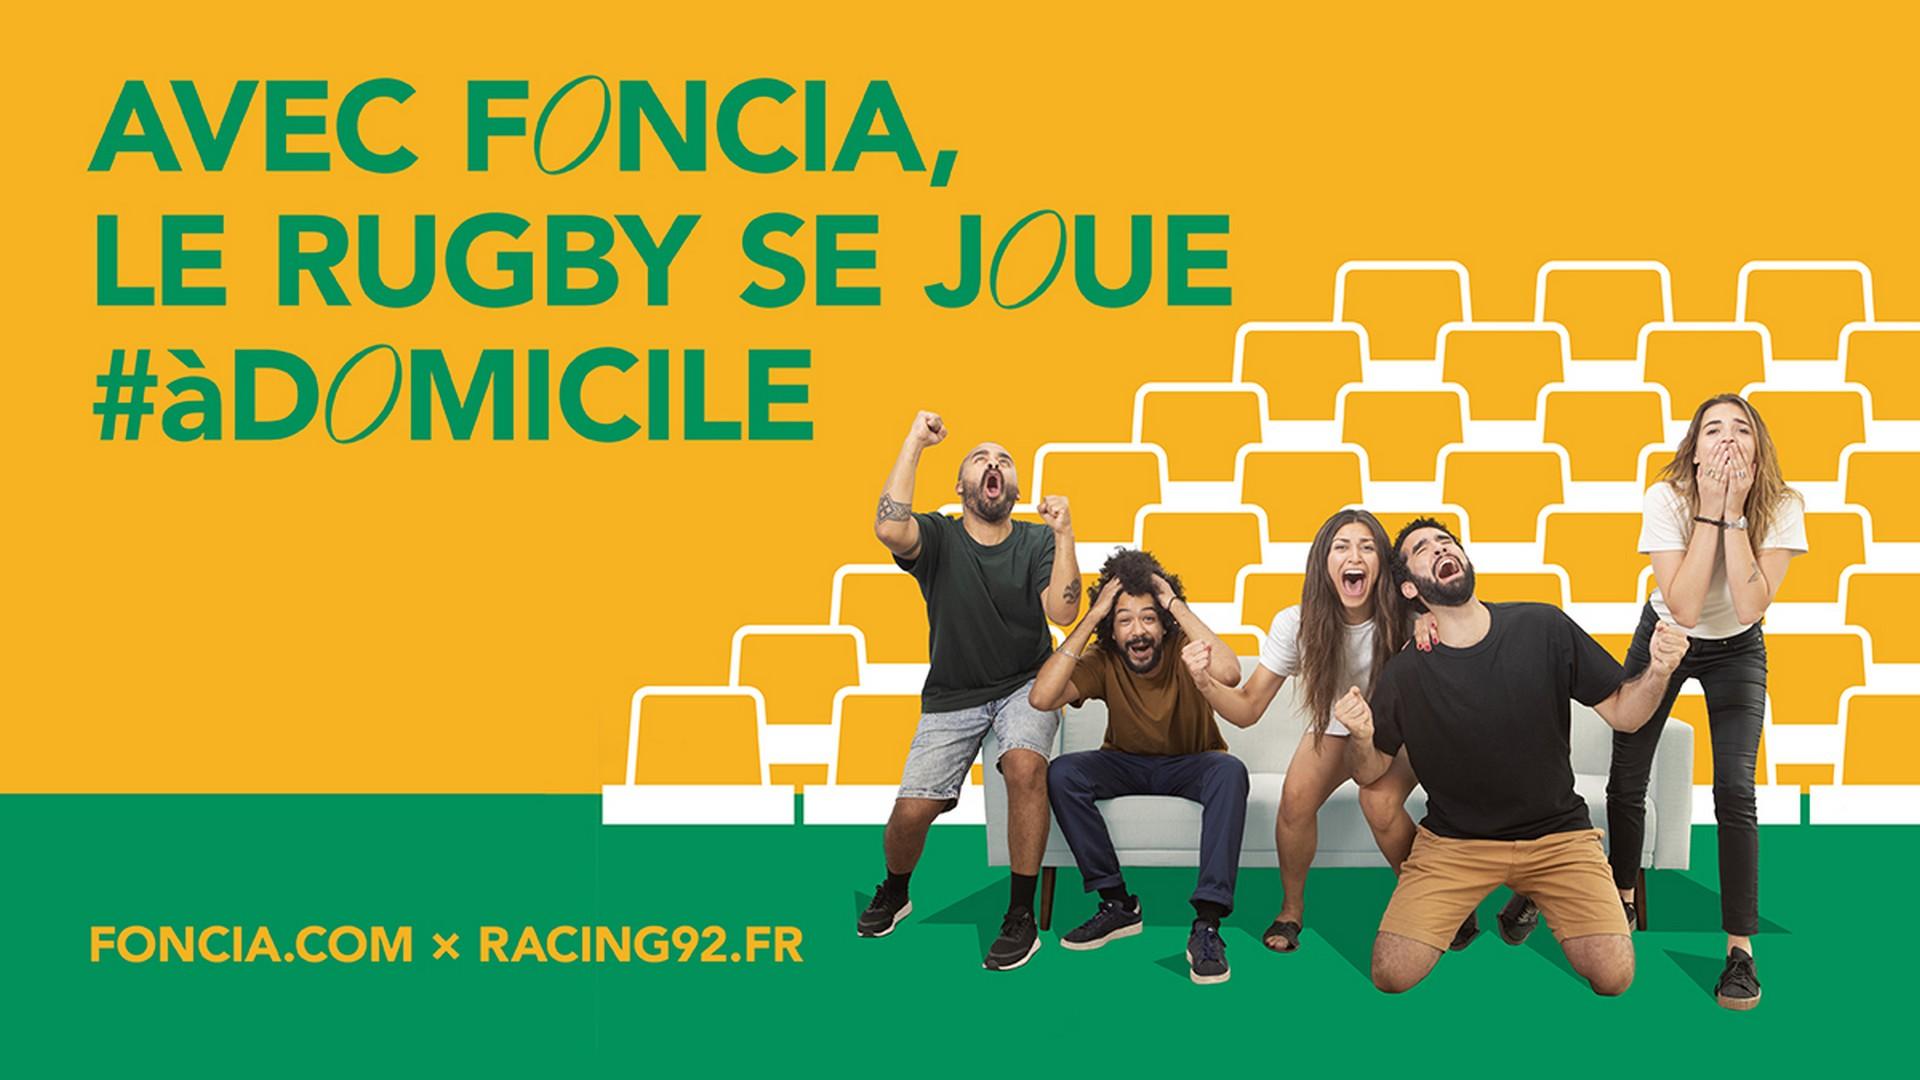 Foncia x Racing 92 (Rgby) 2020